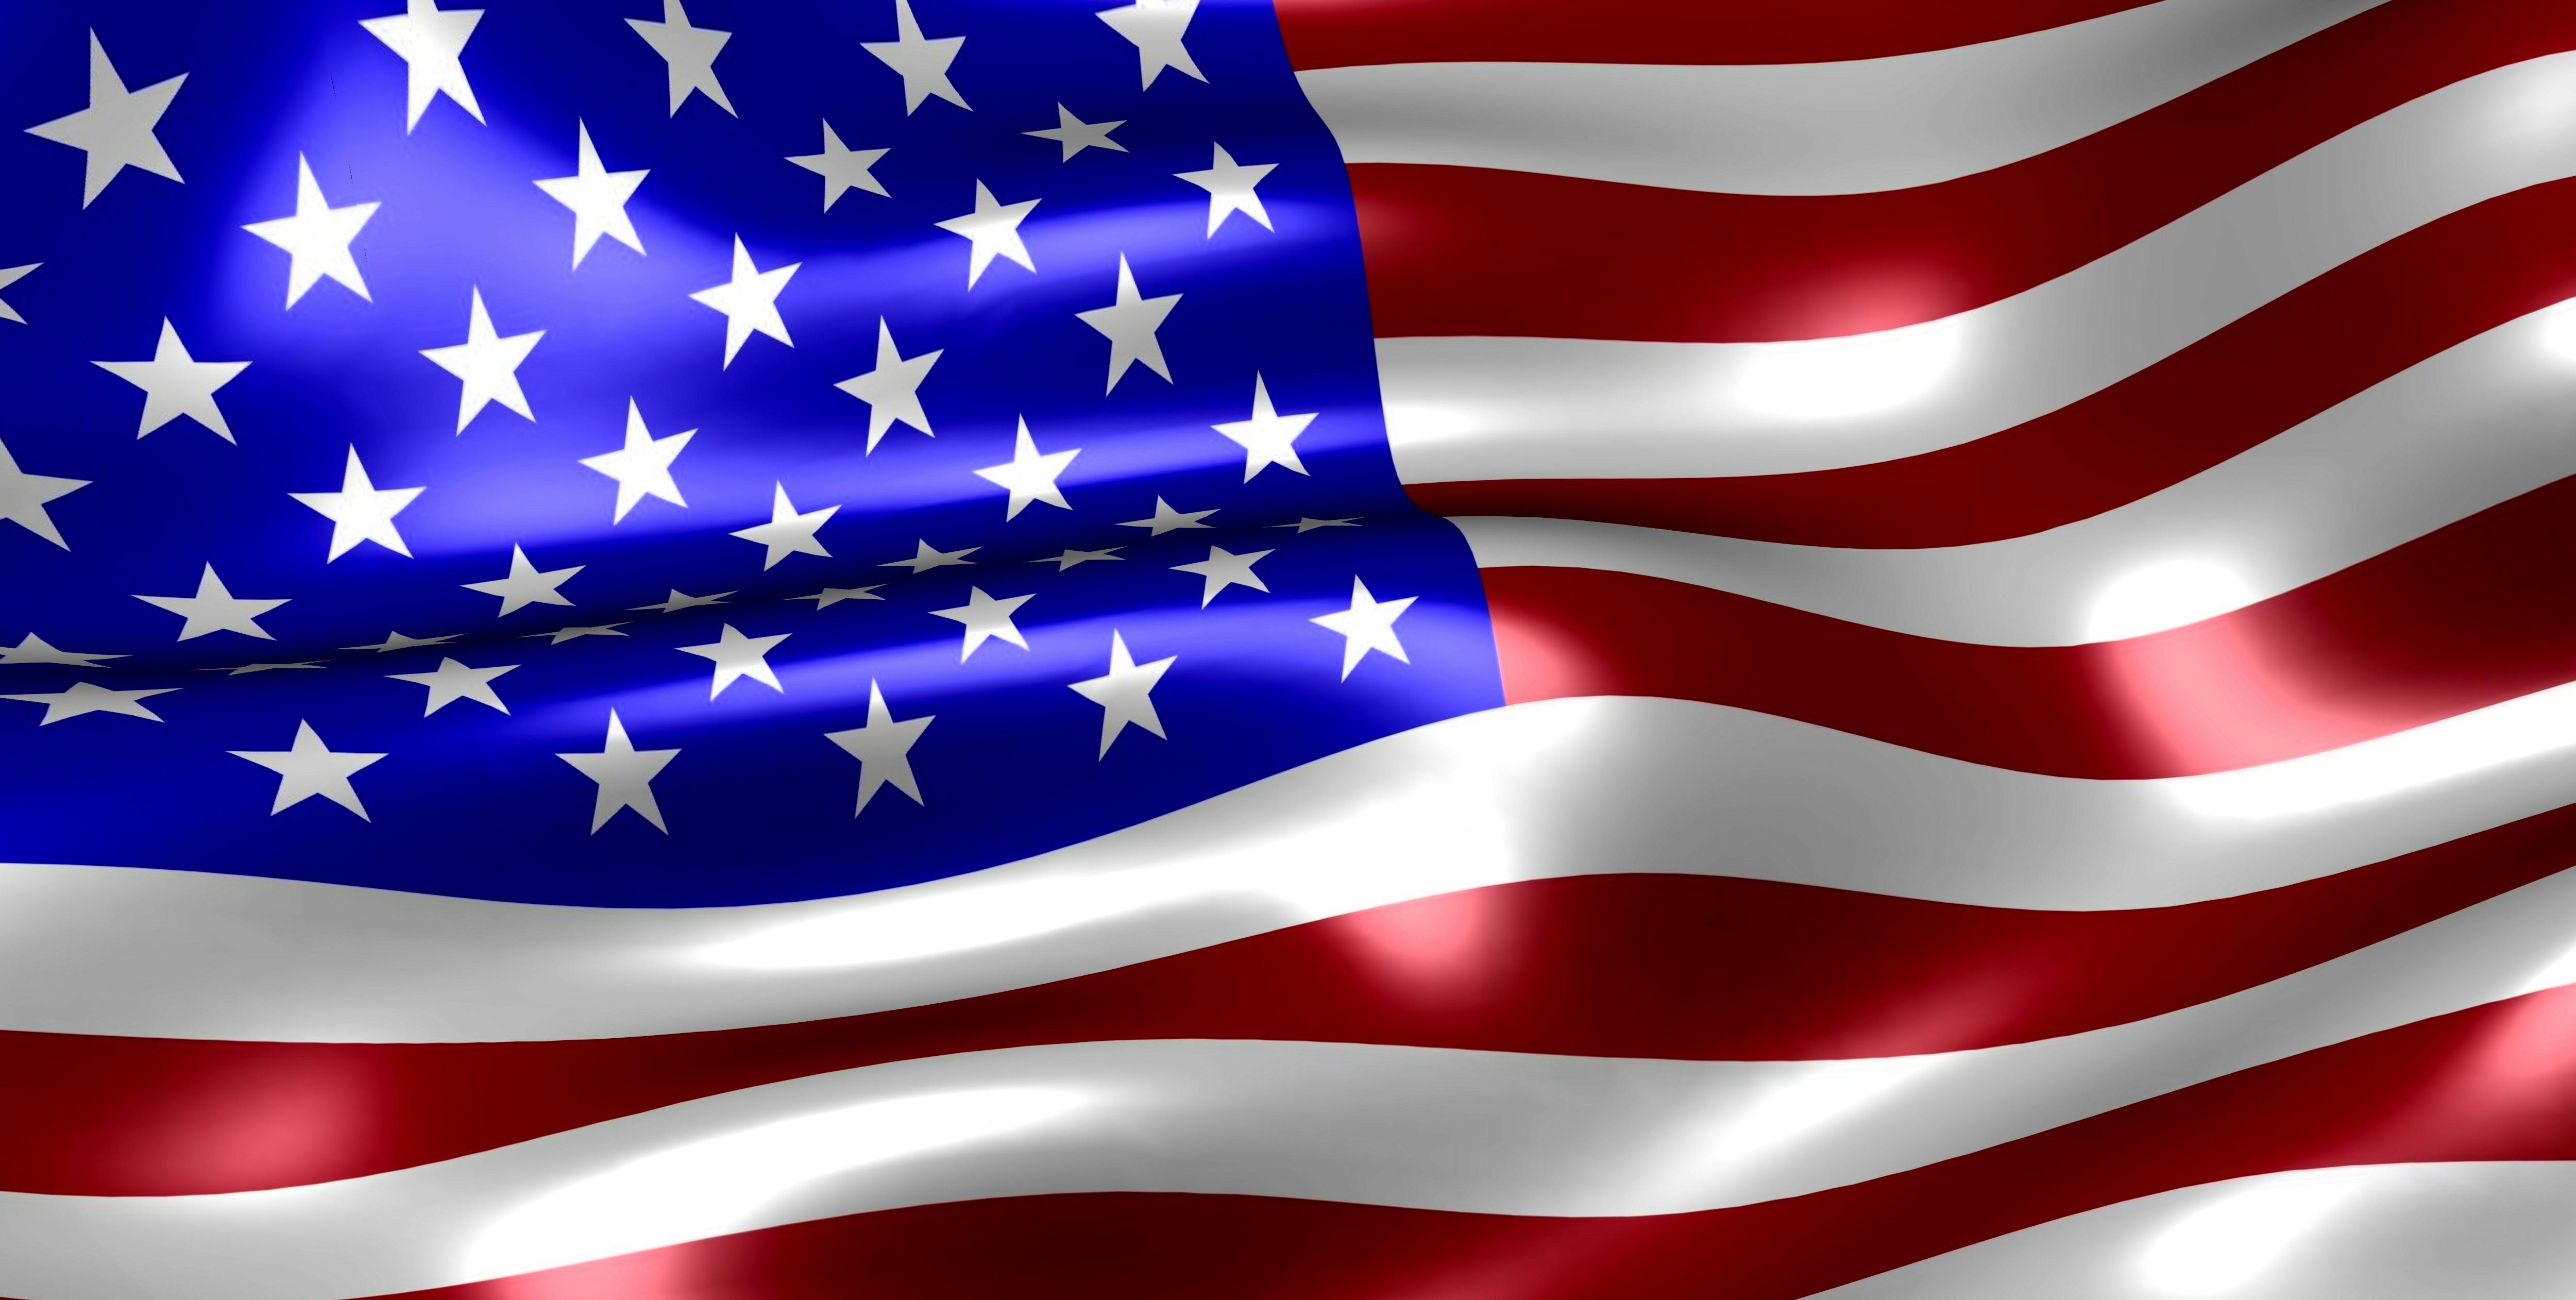 Visual of USA Flag stars and stripes FJM88NL